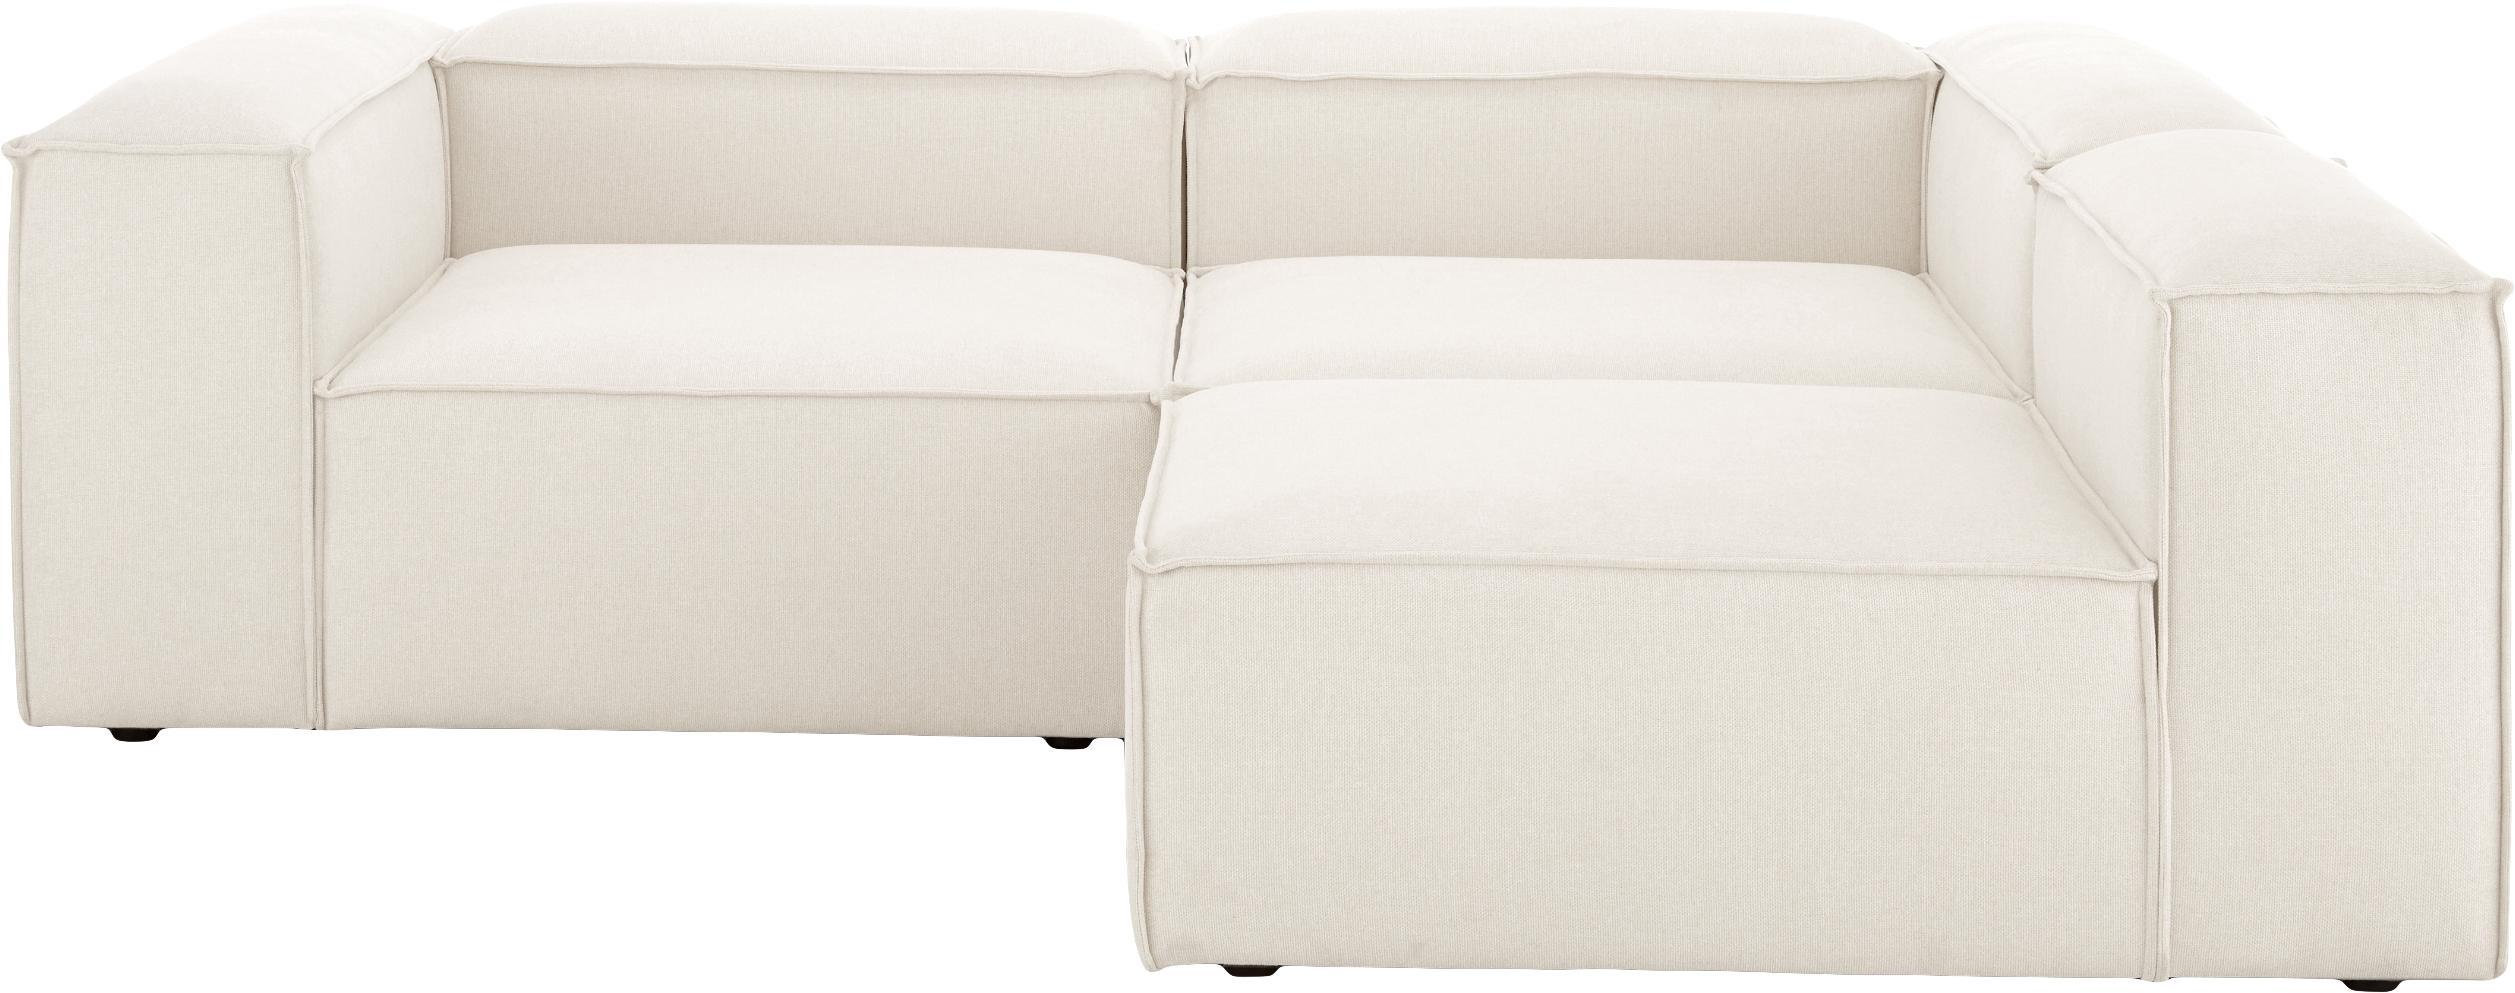 Modulares Sofa Lennon (4-Sitzer), Bezug: Polyester 35.000 Scheuert, Gestell: Massives Kiefernholz, Spe, Füße: Kunststoff, Webstoff Beige, B 326 x T 119 cm